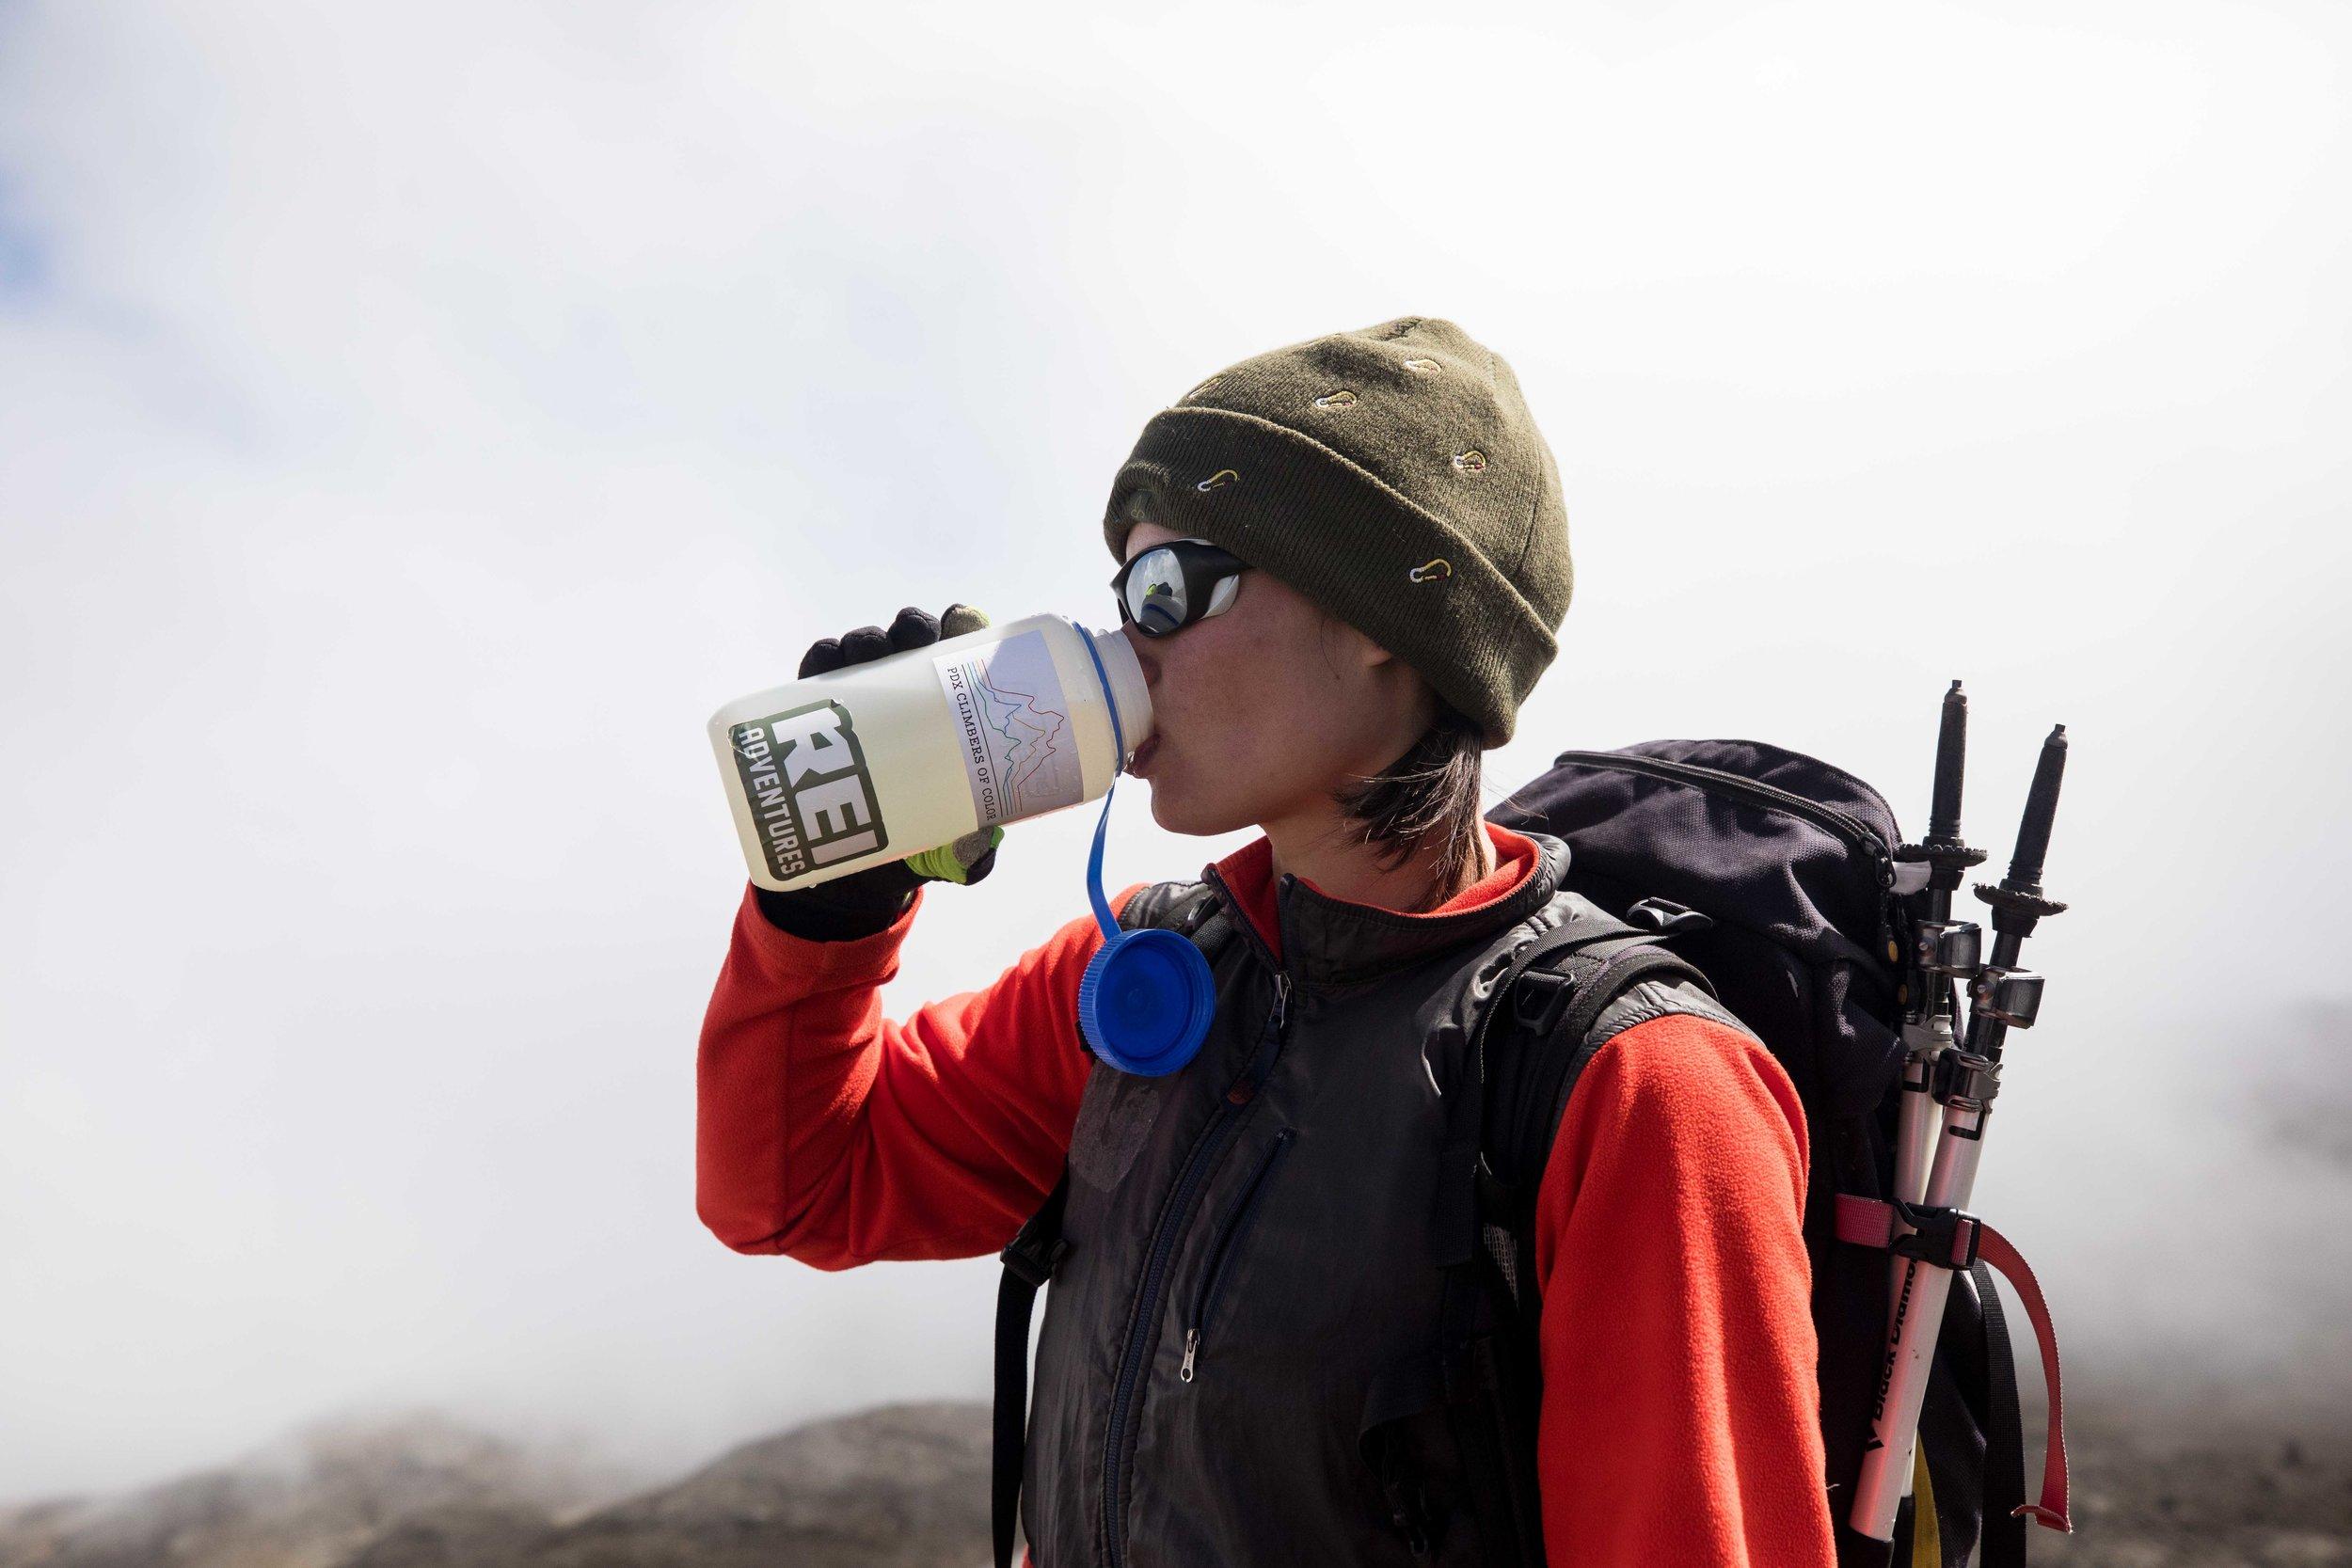 ajw_REI_Kilimanjaro-28.jpg